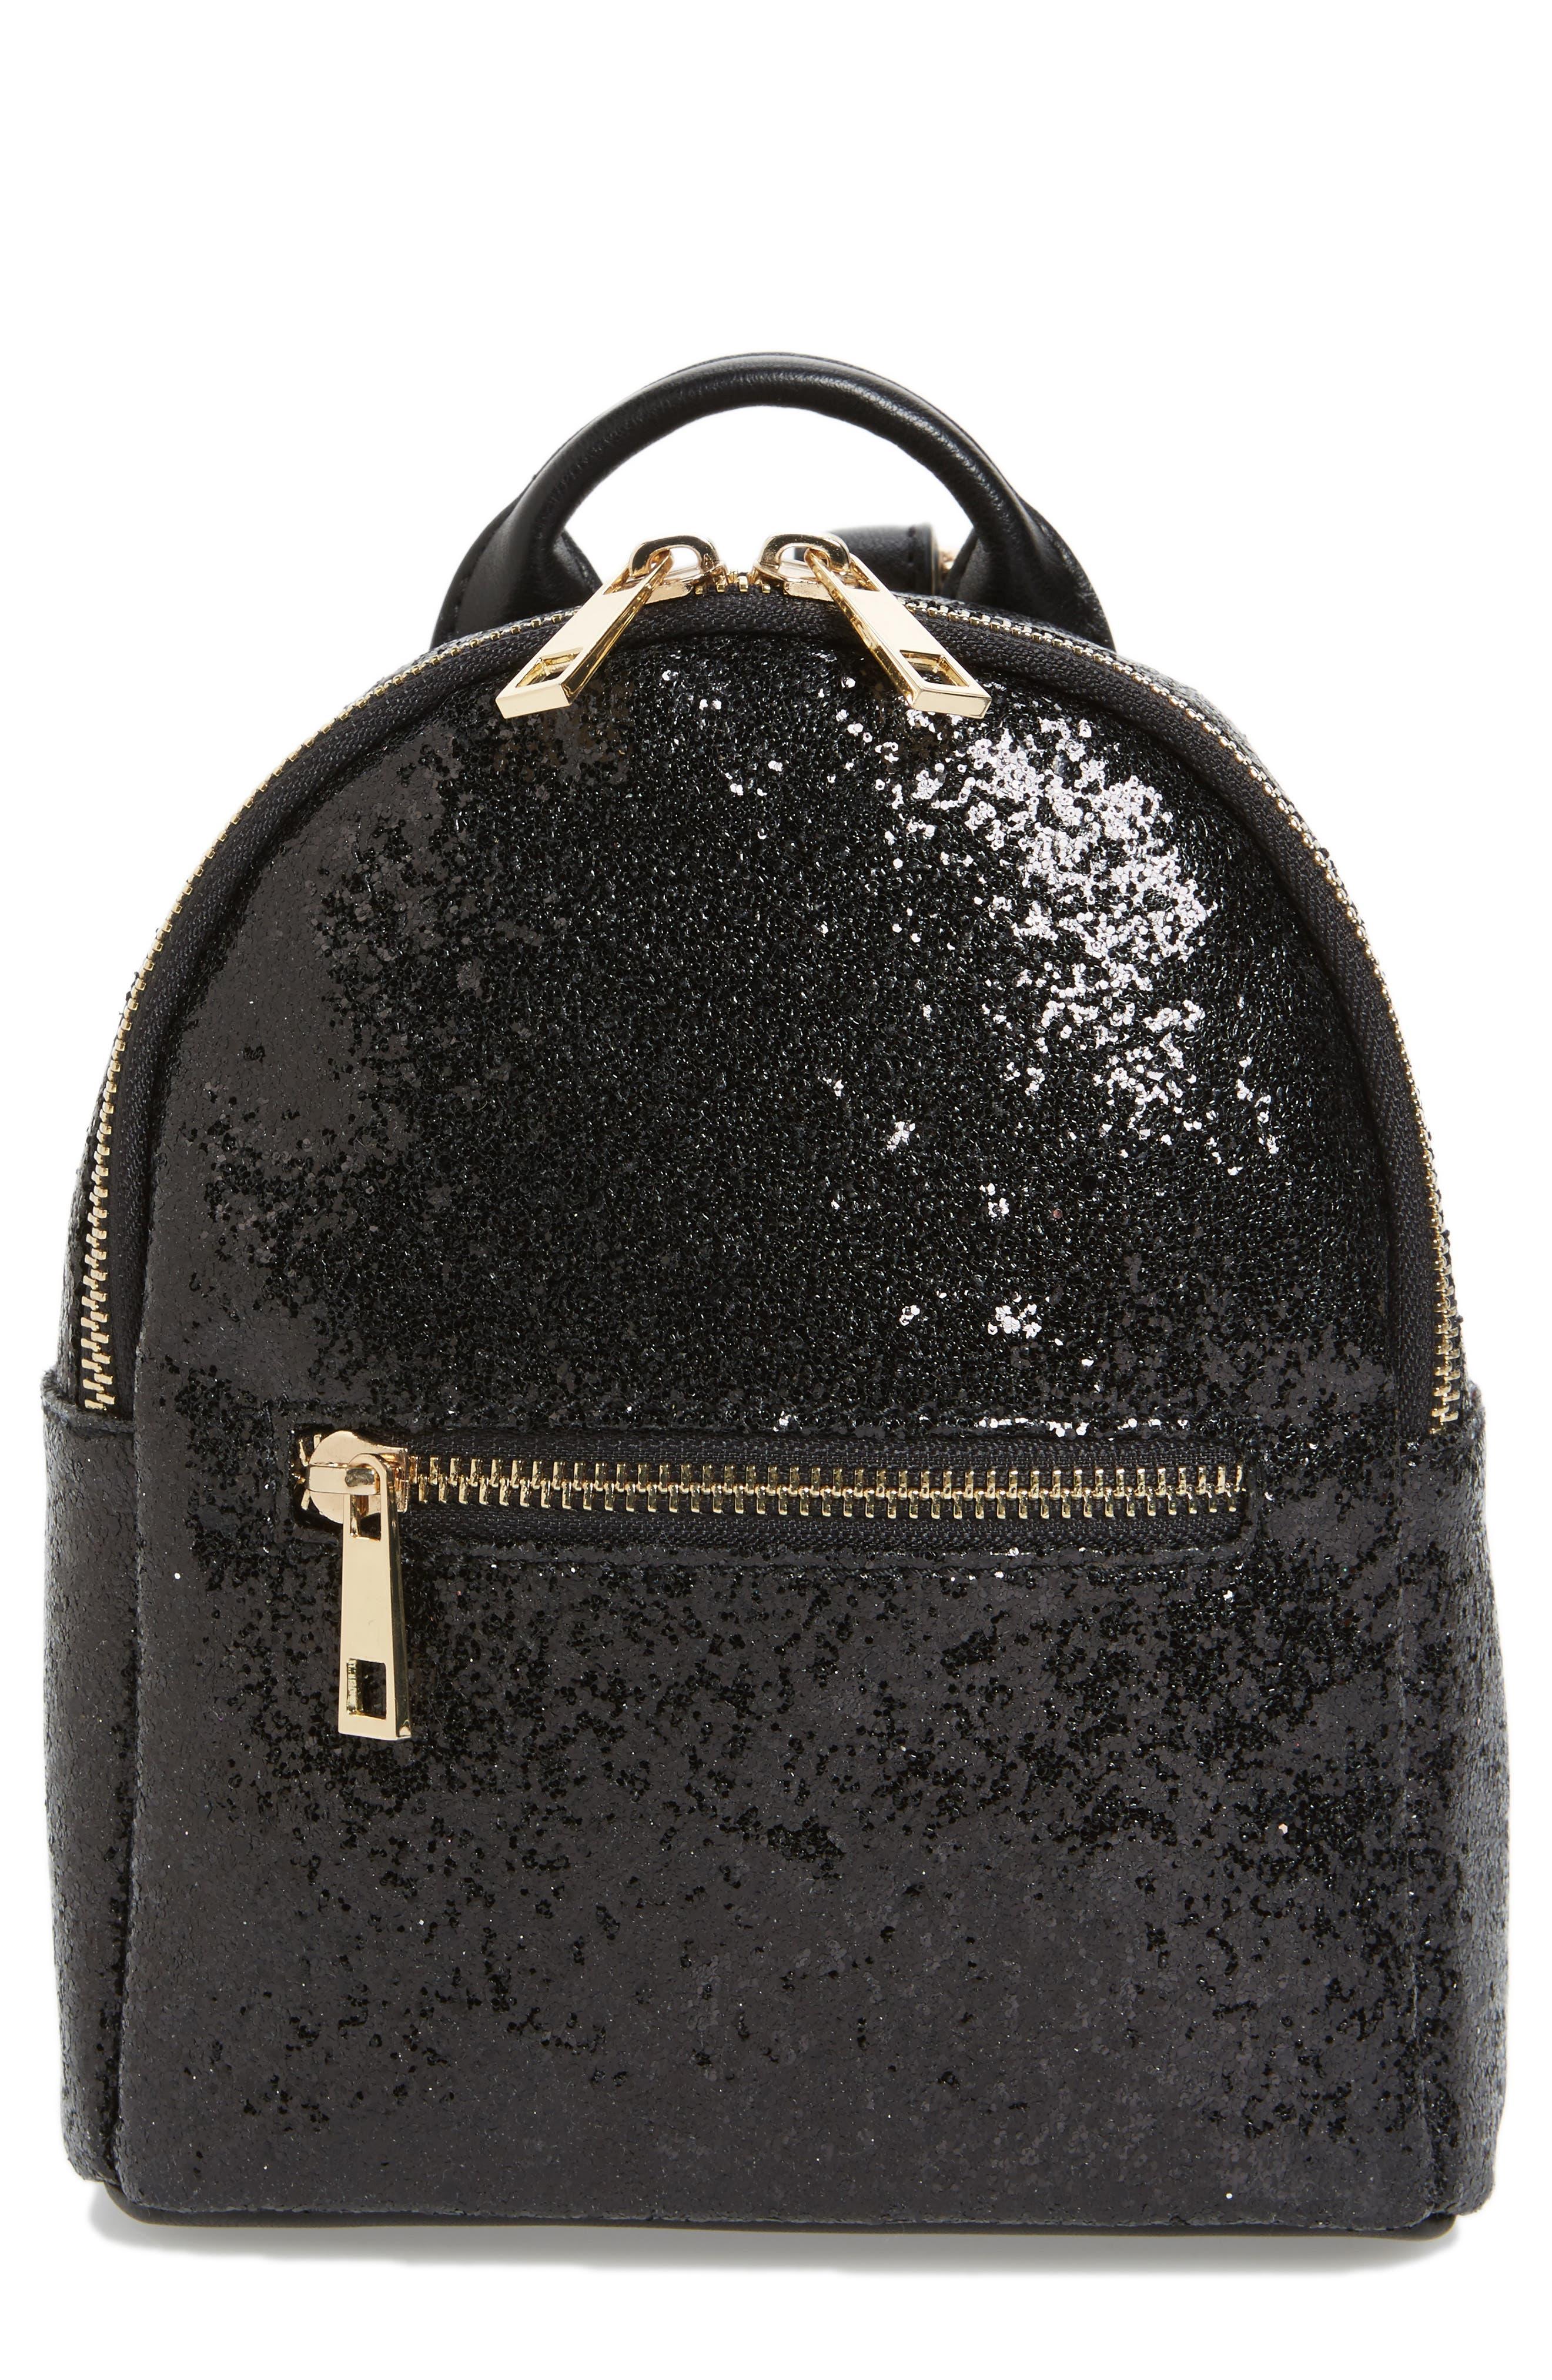 Mali + Lili Glitter Vegan Leather Backpack,                         Main,                         color, BLACK